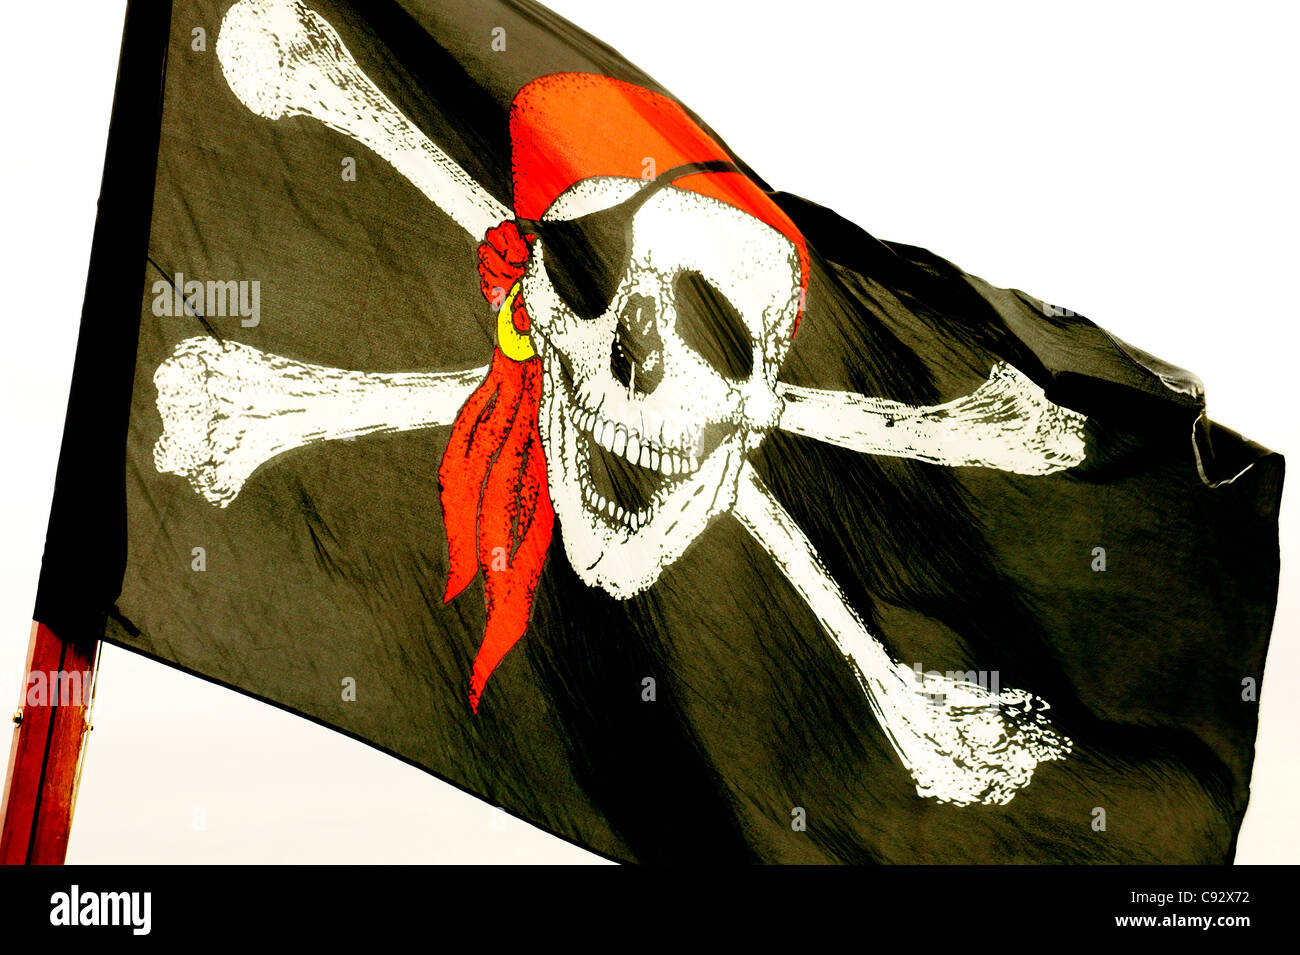 The Jolly Roger skull and cross bones pirate flag - Stock Image